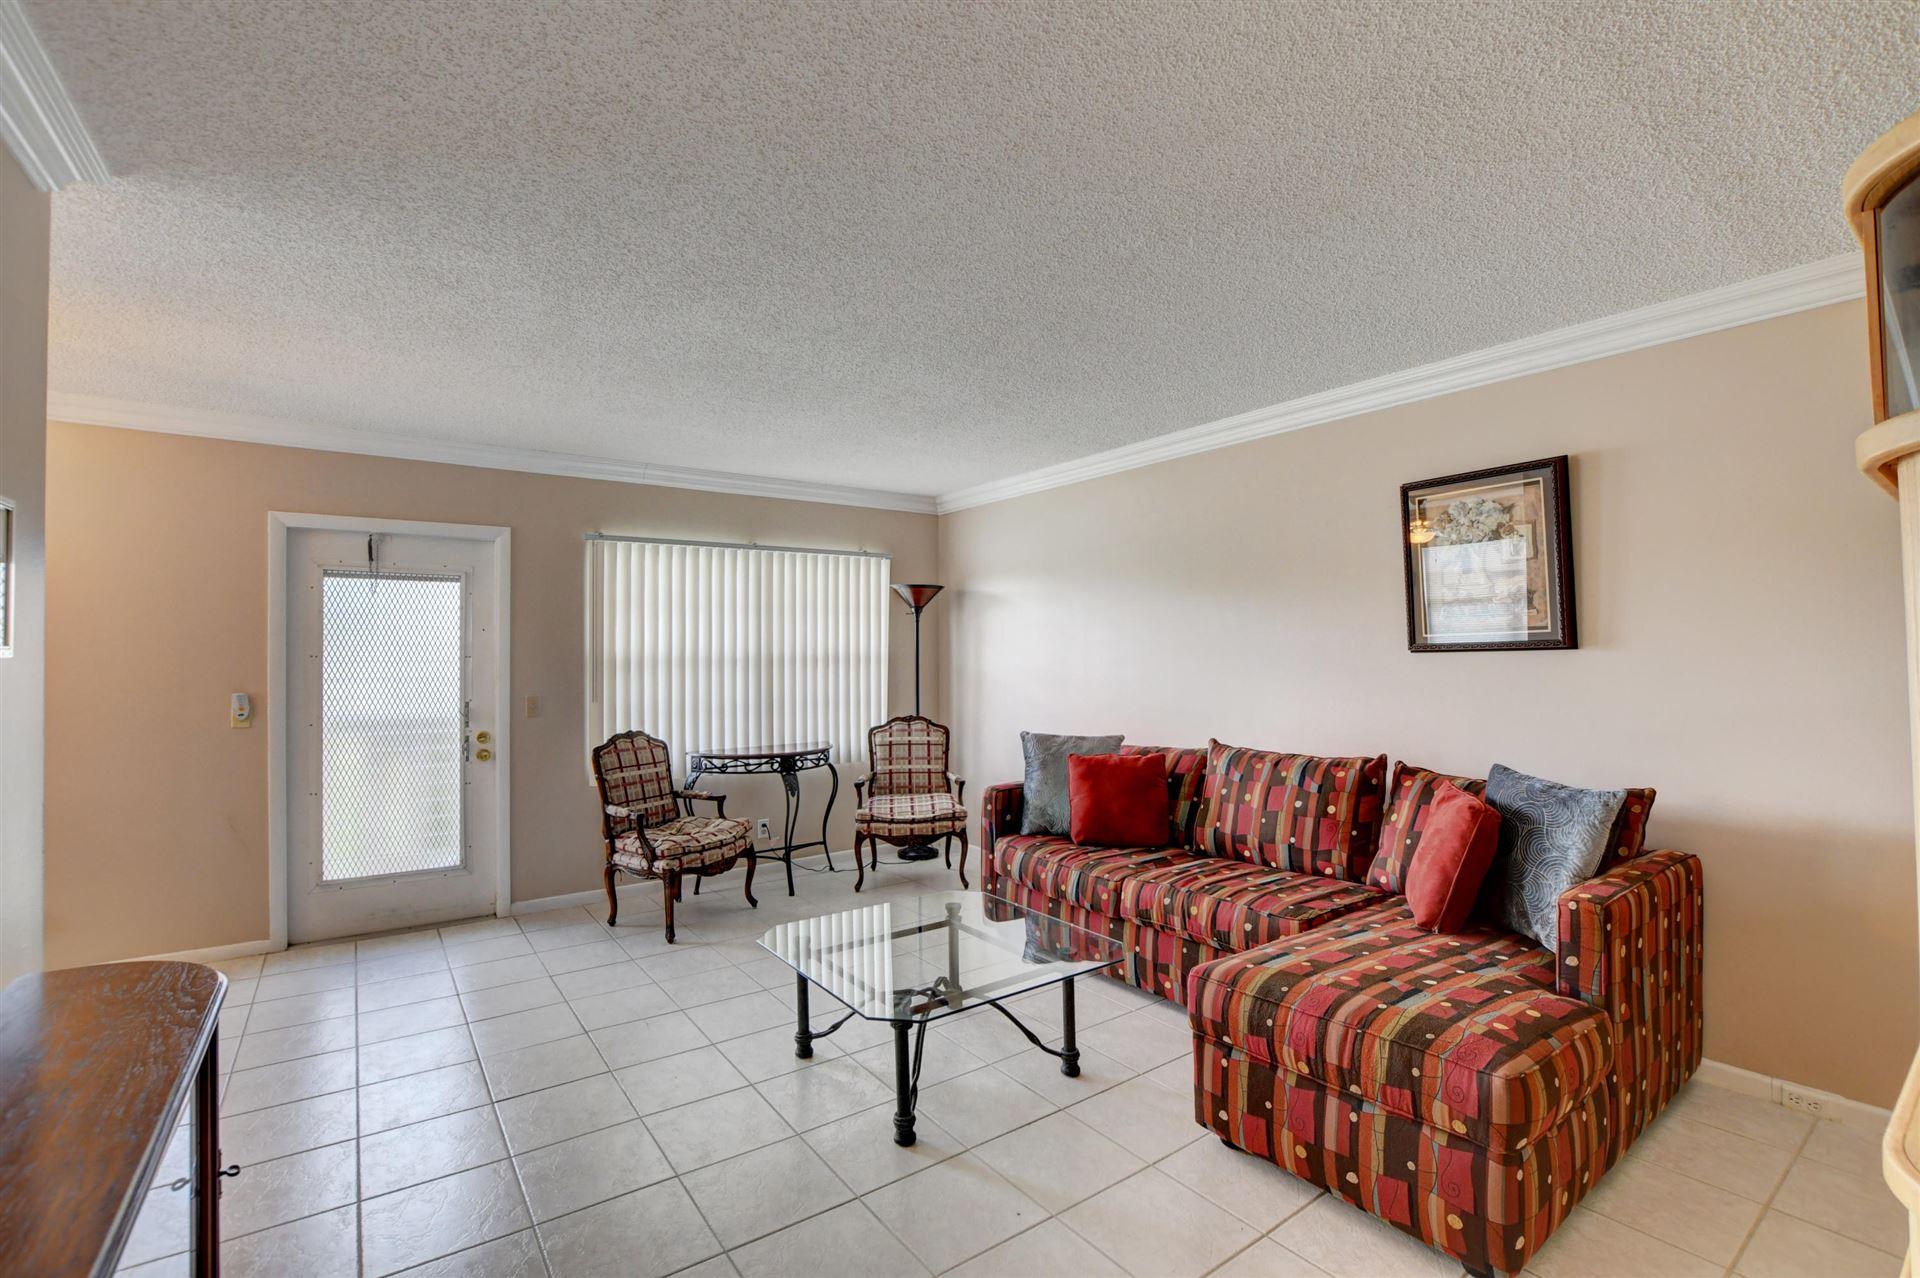 196 Dorset E, Boca Raton, FL 33434 - MLS#: RX-10716889